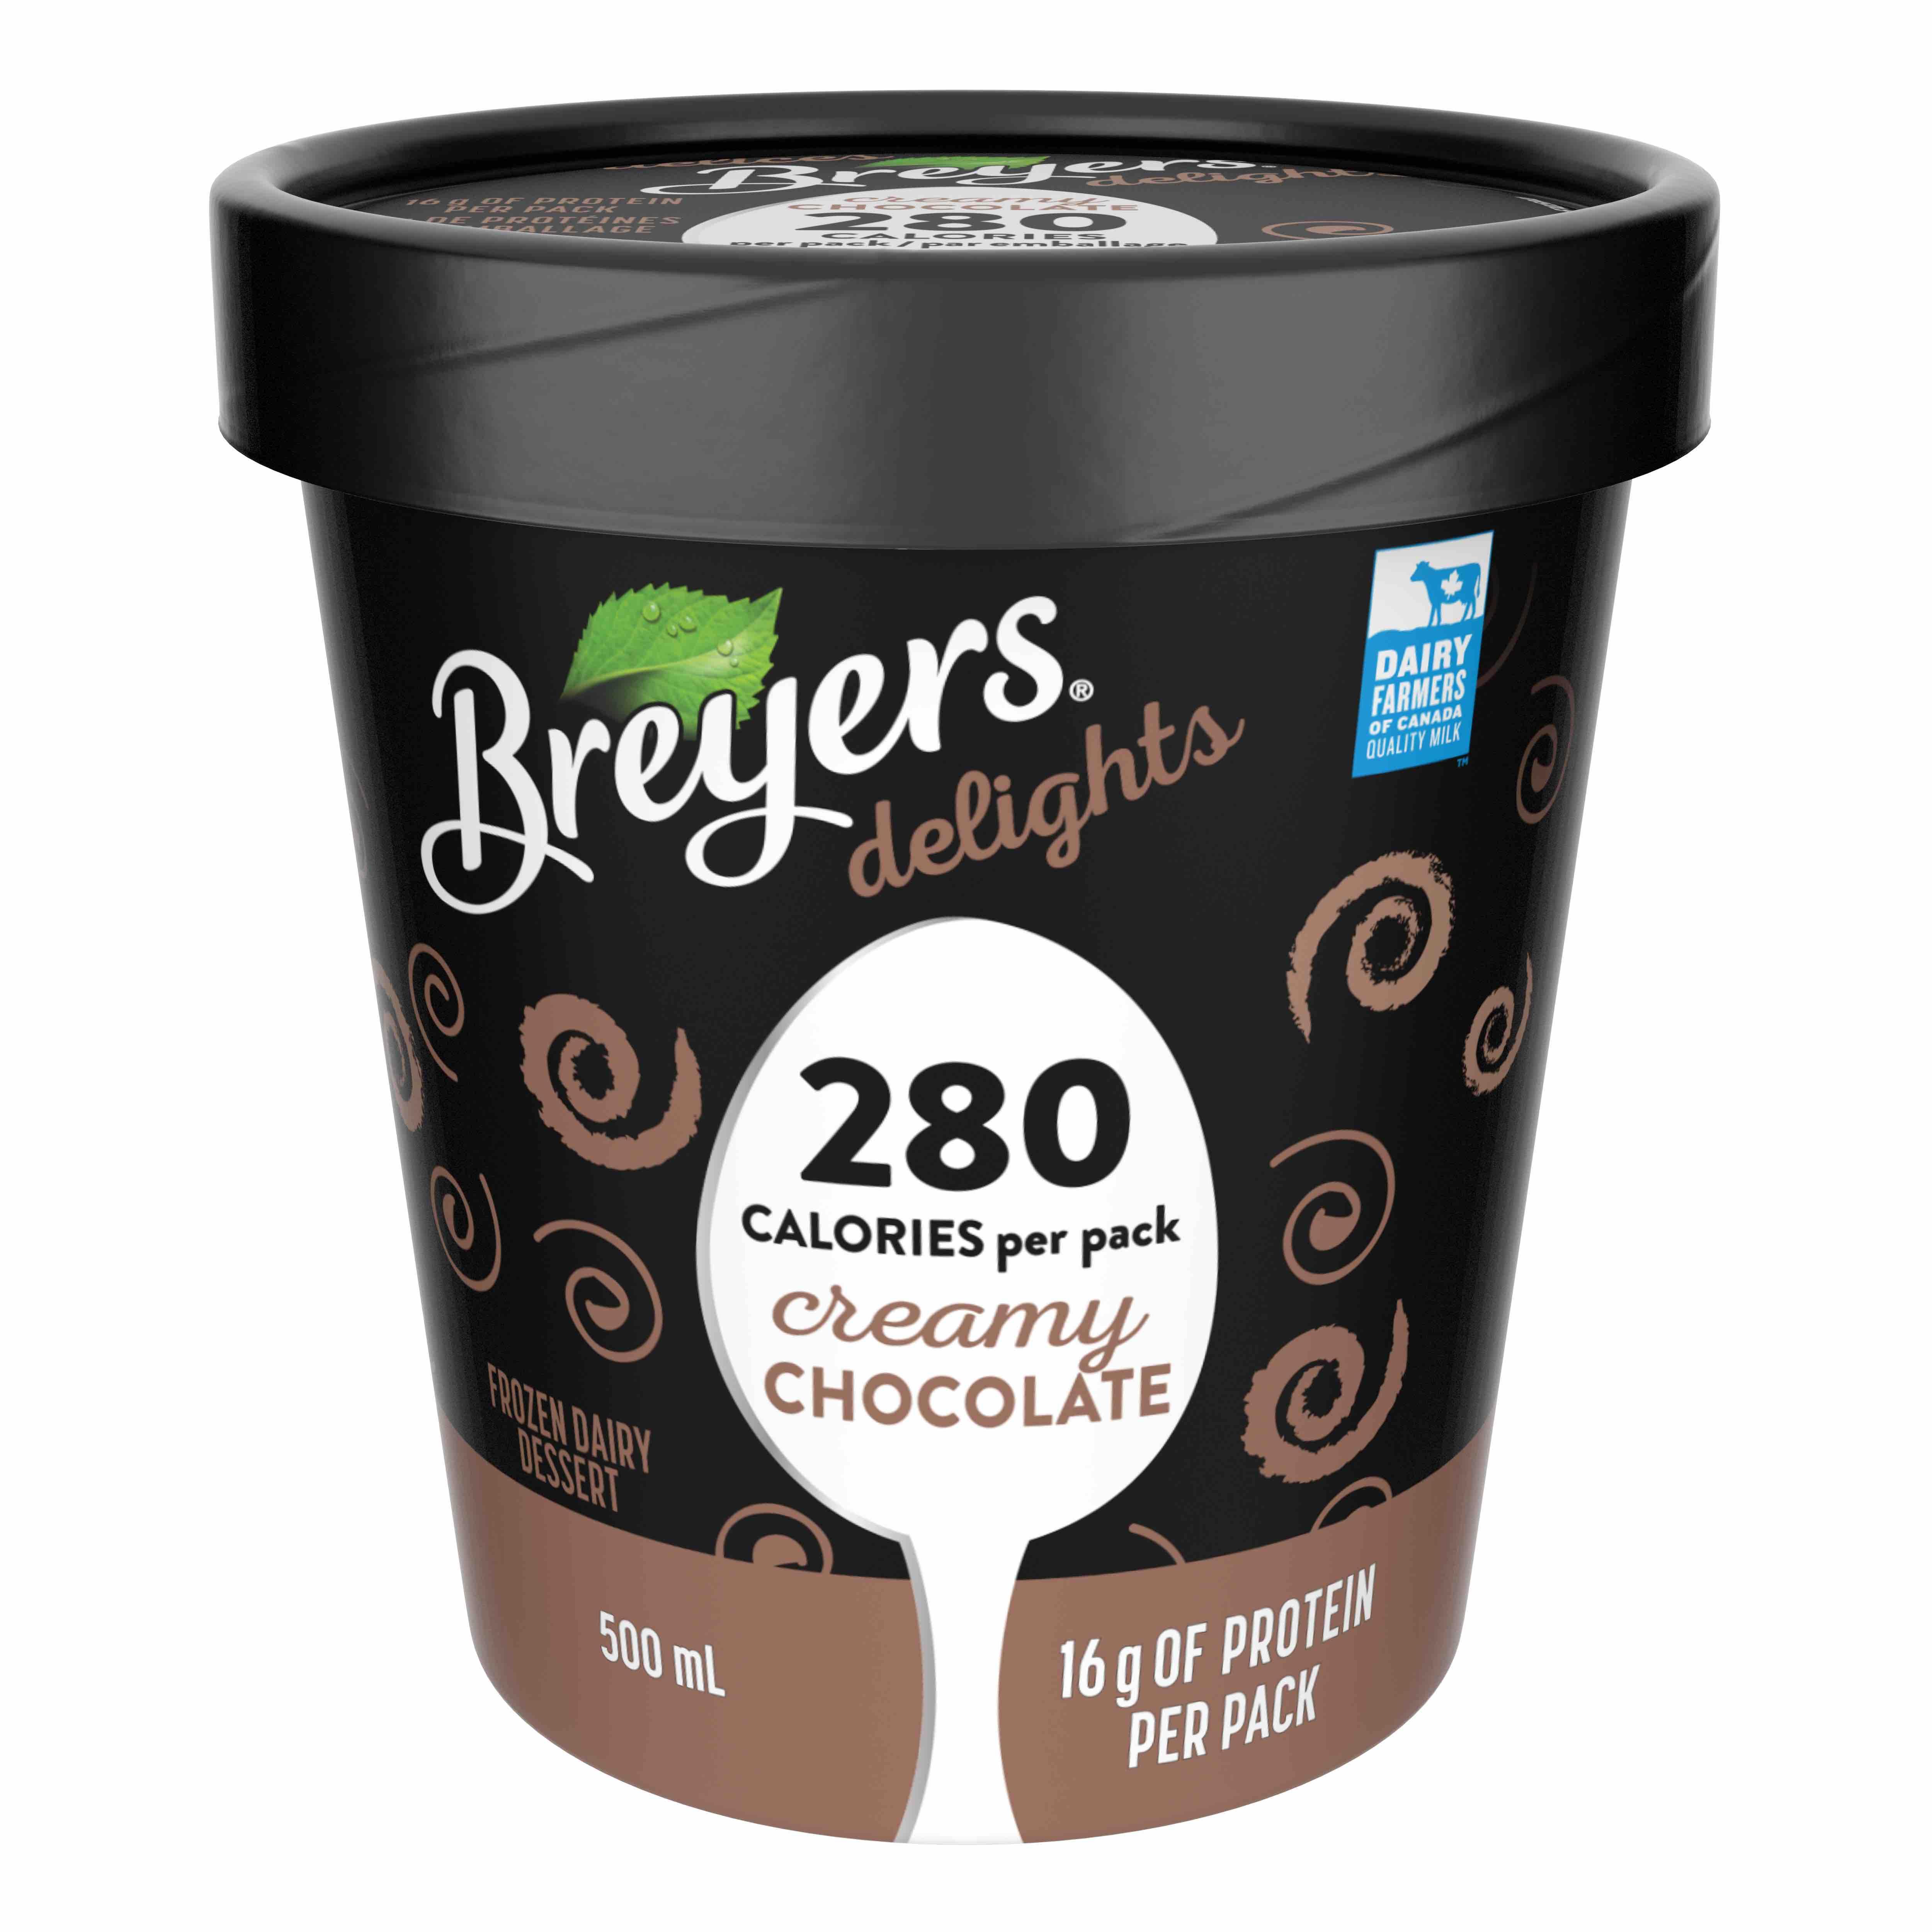 Pint of Breyers Delights chocolate ice cream